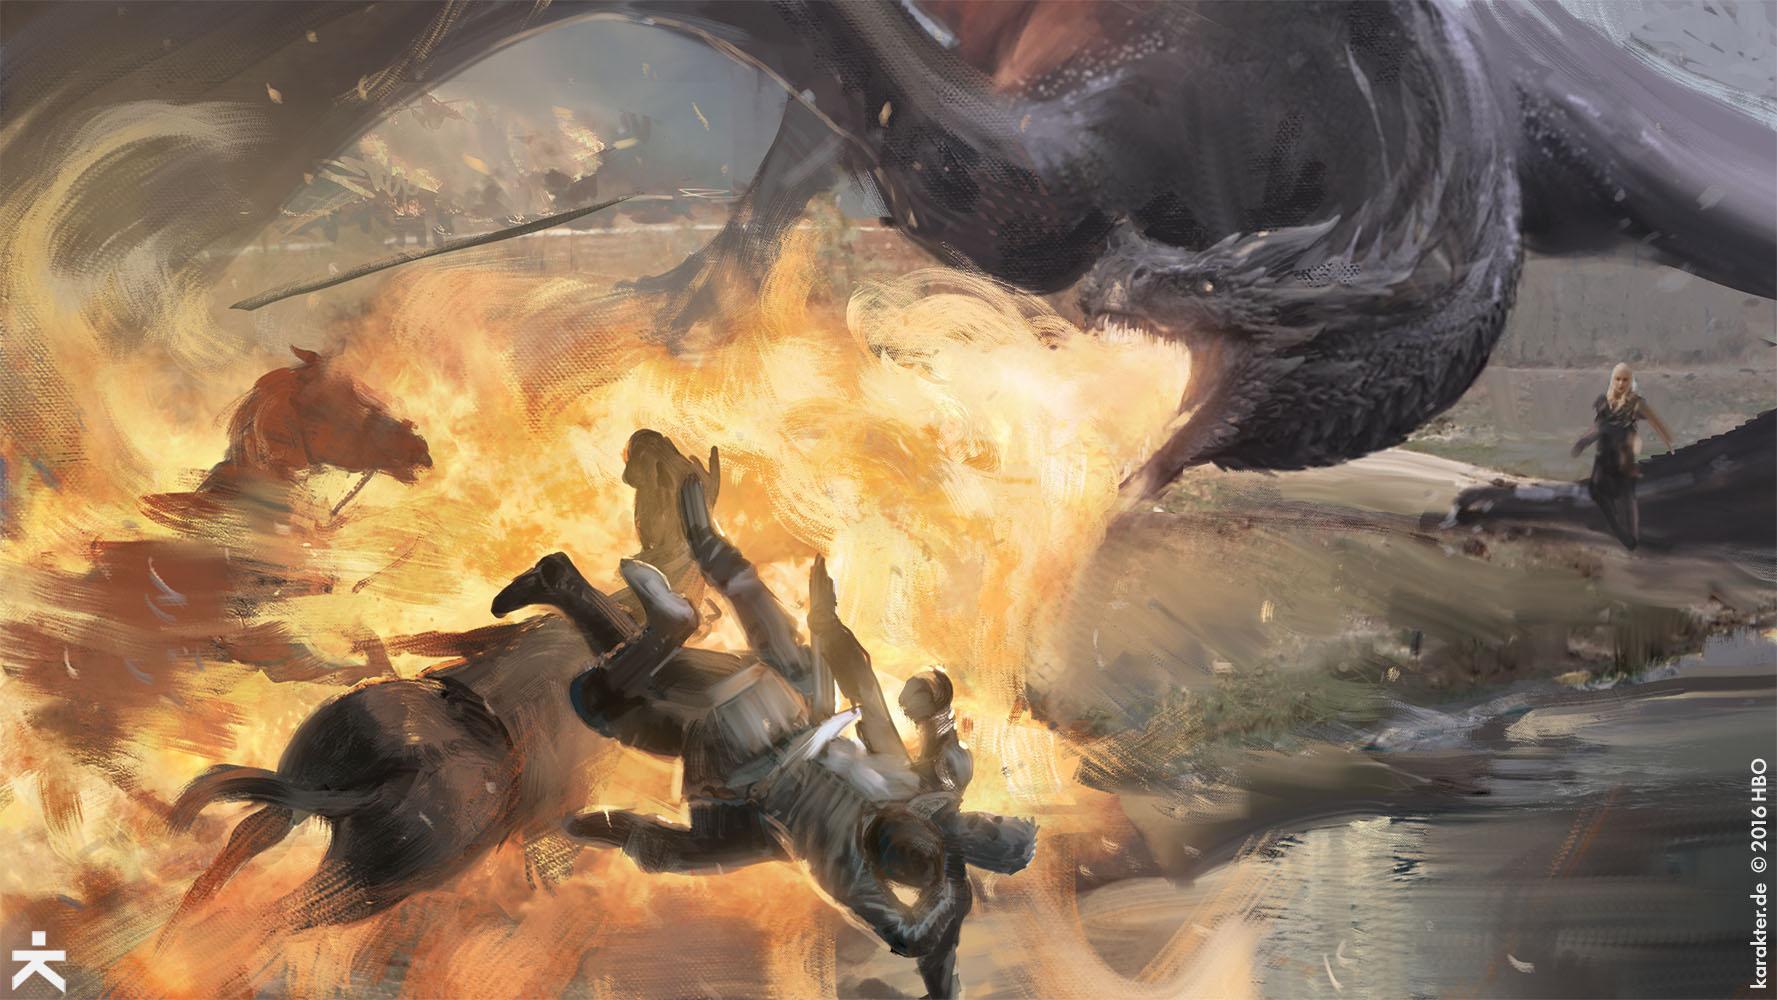 Battle of the bastards part 4 - 4 3